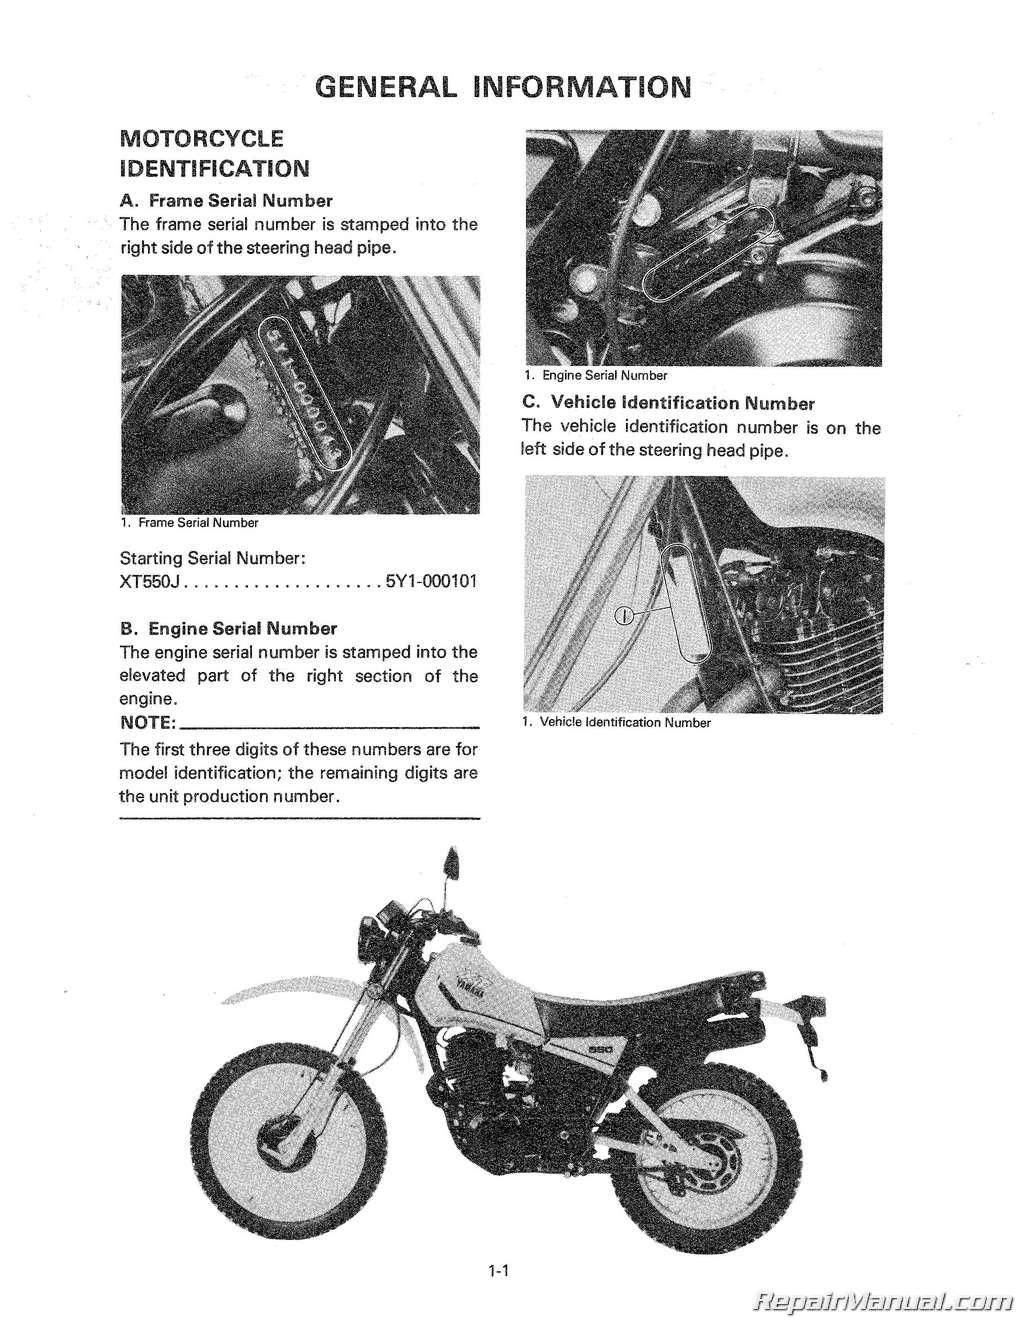 1982 Yamaha XT550 Motorcycle Service Repair Maintenance Manual